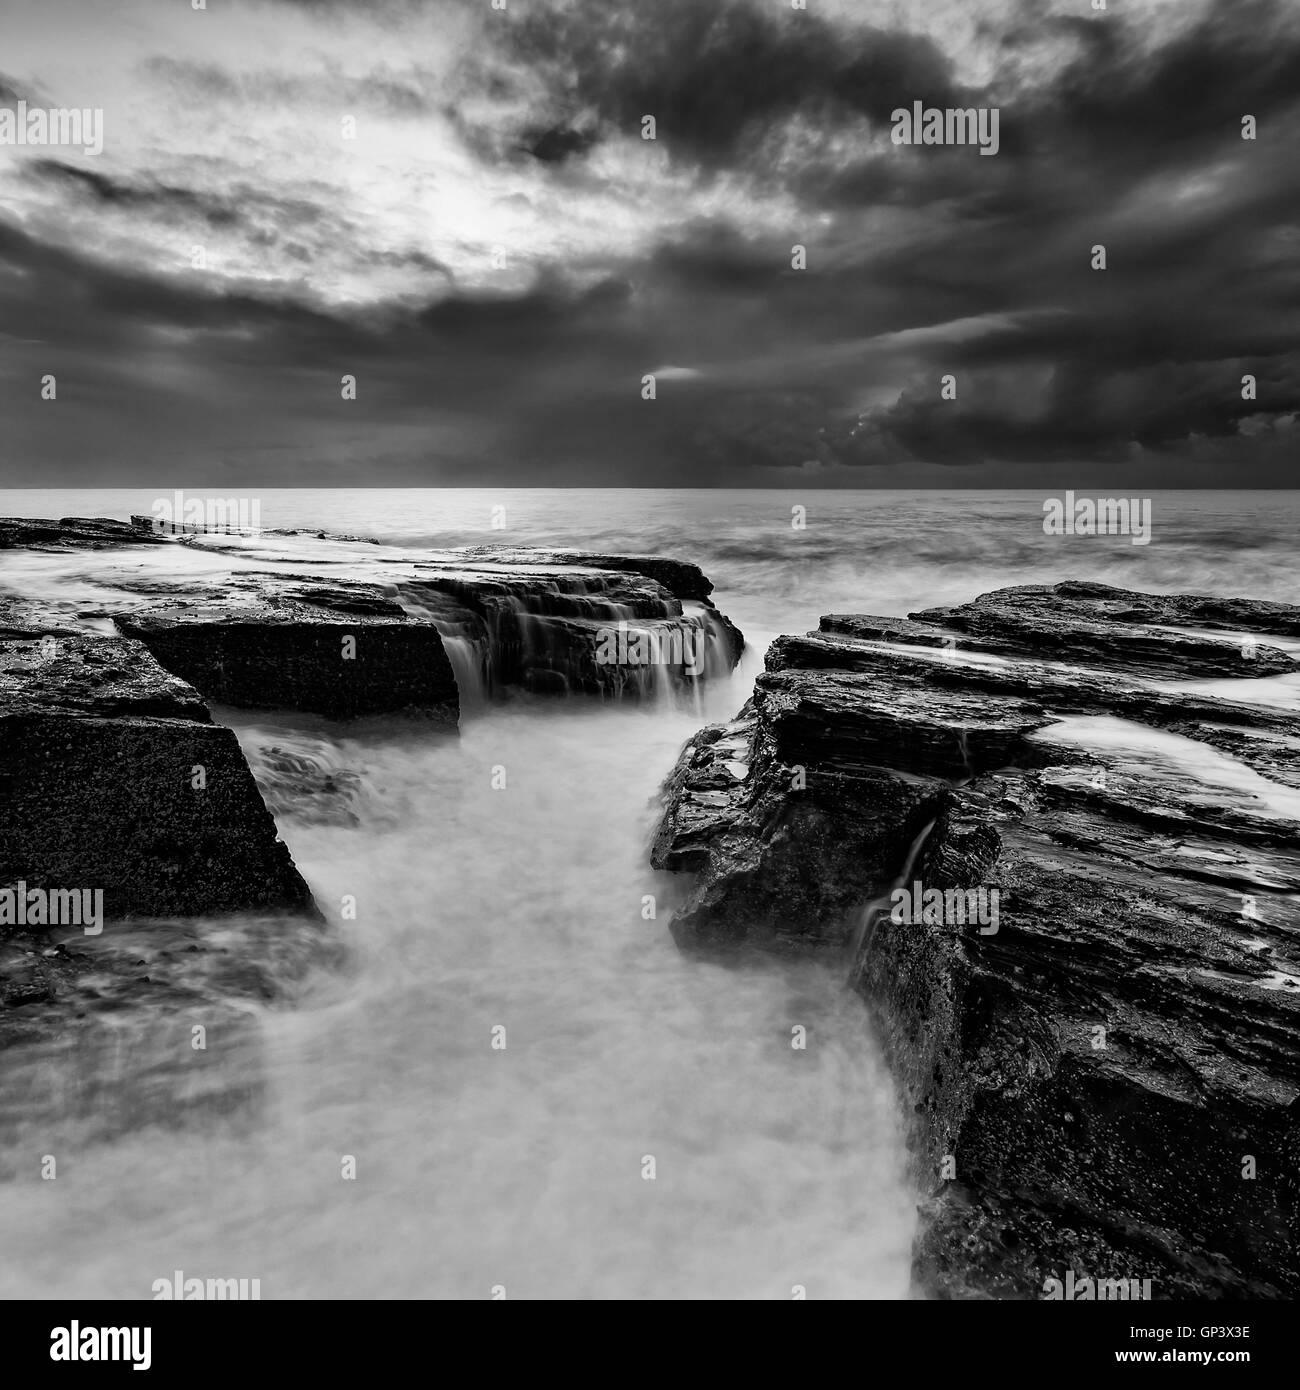 Pacific ocean waves erosion of Australian coastline at Sydney Northern beaches. Crack in sandstone boulders under - Stock Image